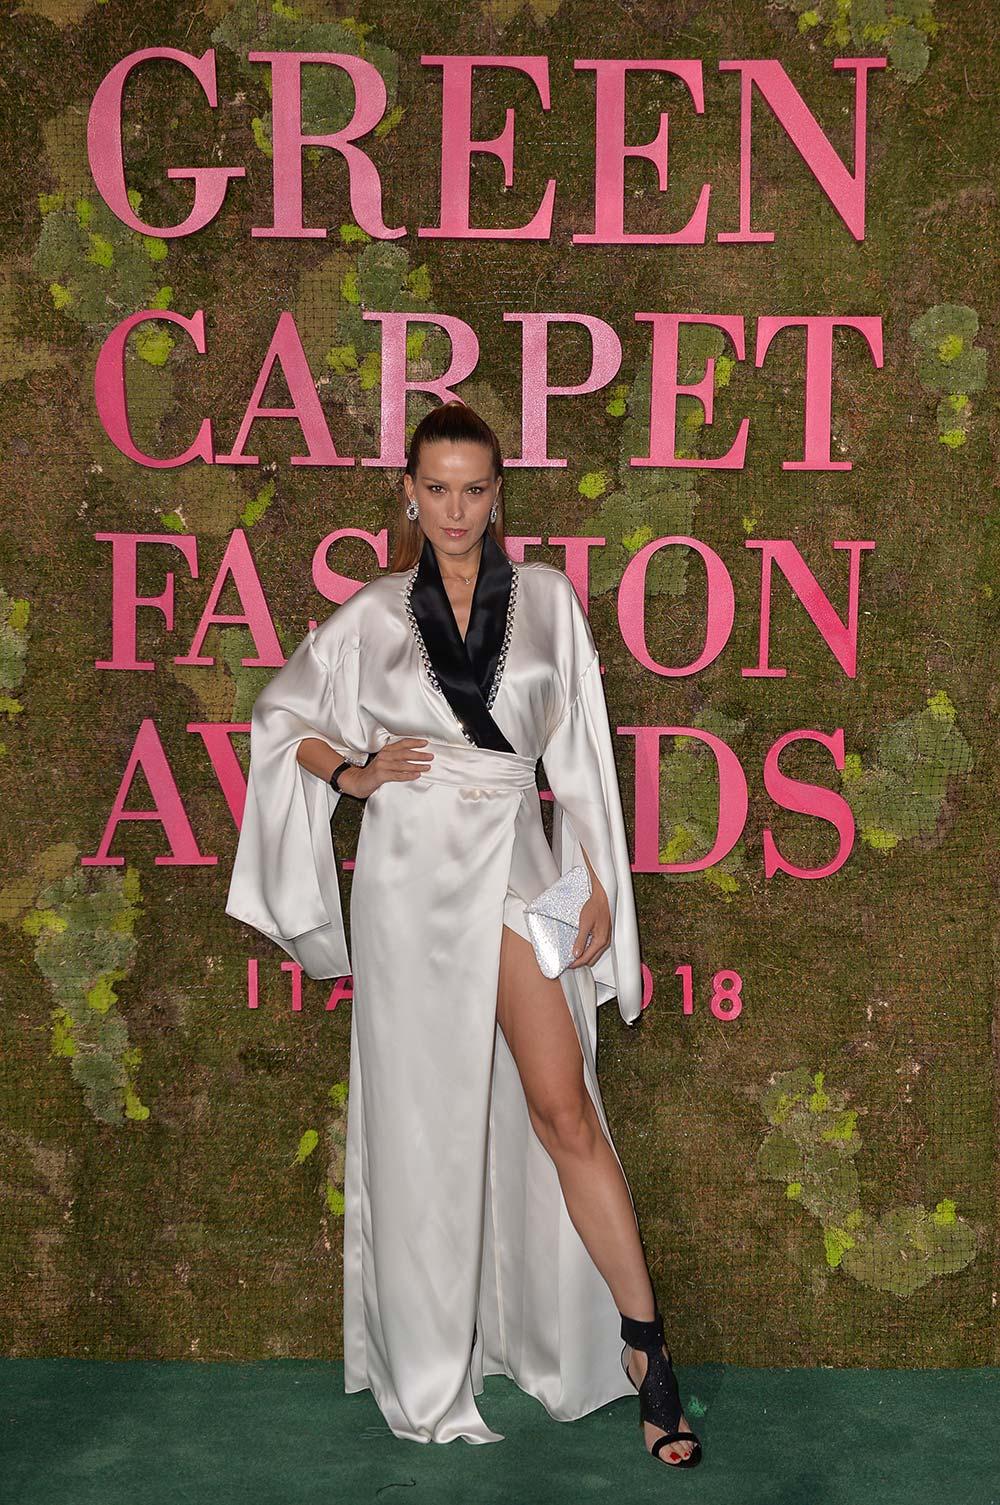 Green Carpet Fashion Awards 2018 - Petra Nemcova - Hair & Makeup Massimo Serini Team